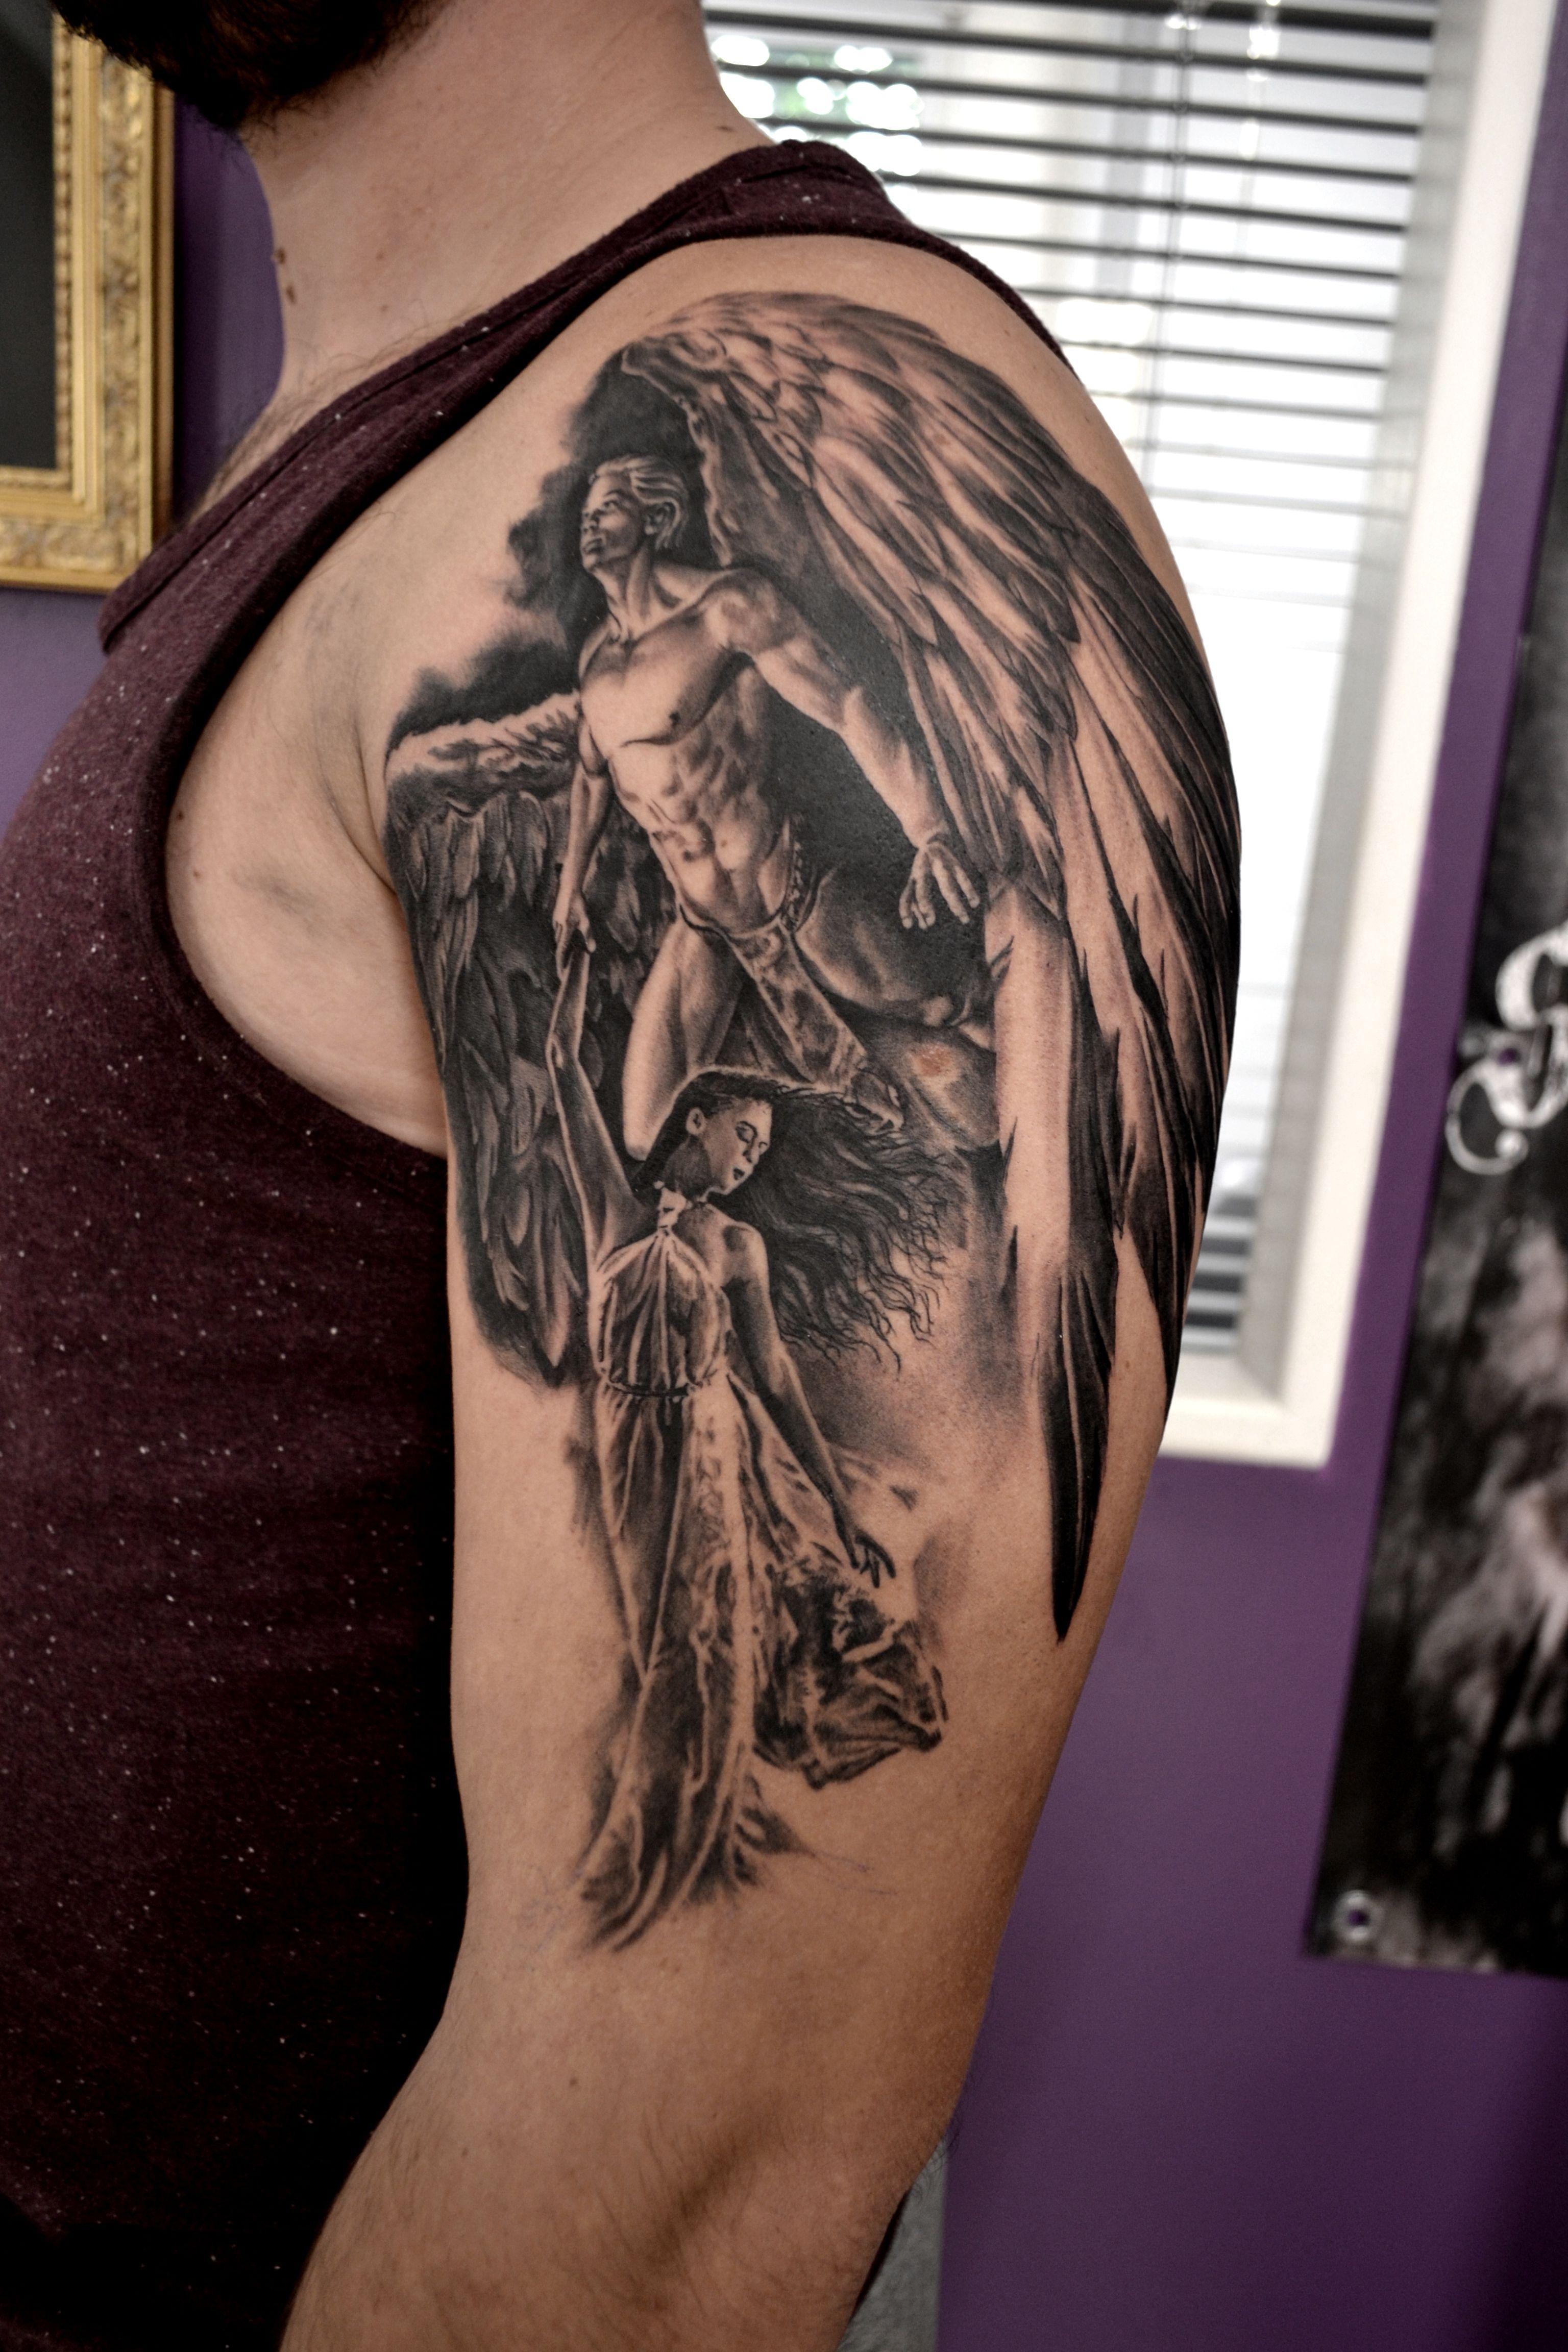 tatouage angel par stephane bueno tatoueur studio black corner tattoo valence tattoo tattoos. Black Bedroom Furniture Sets. Home Design Ideas